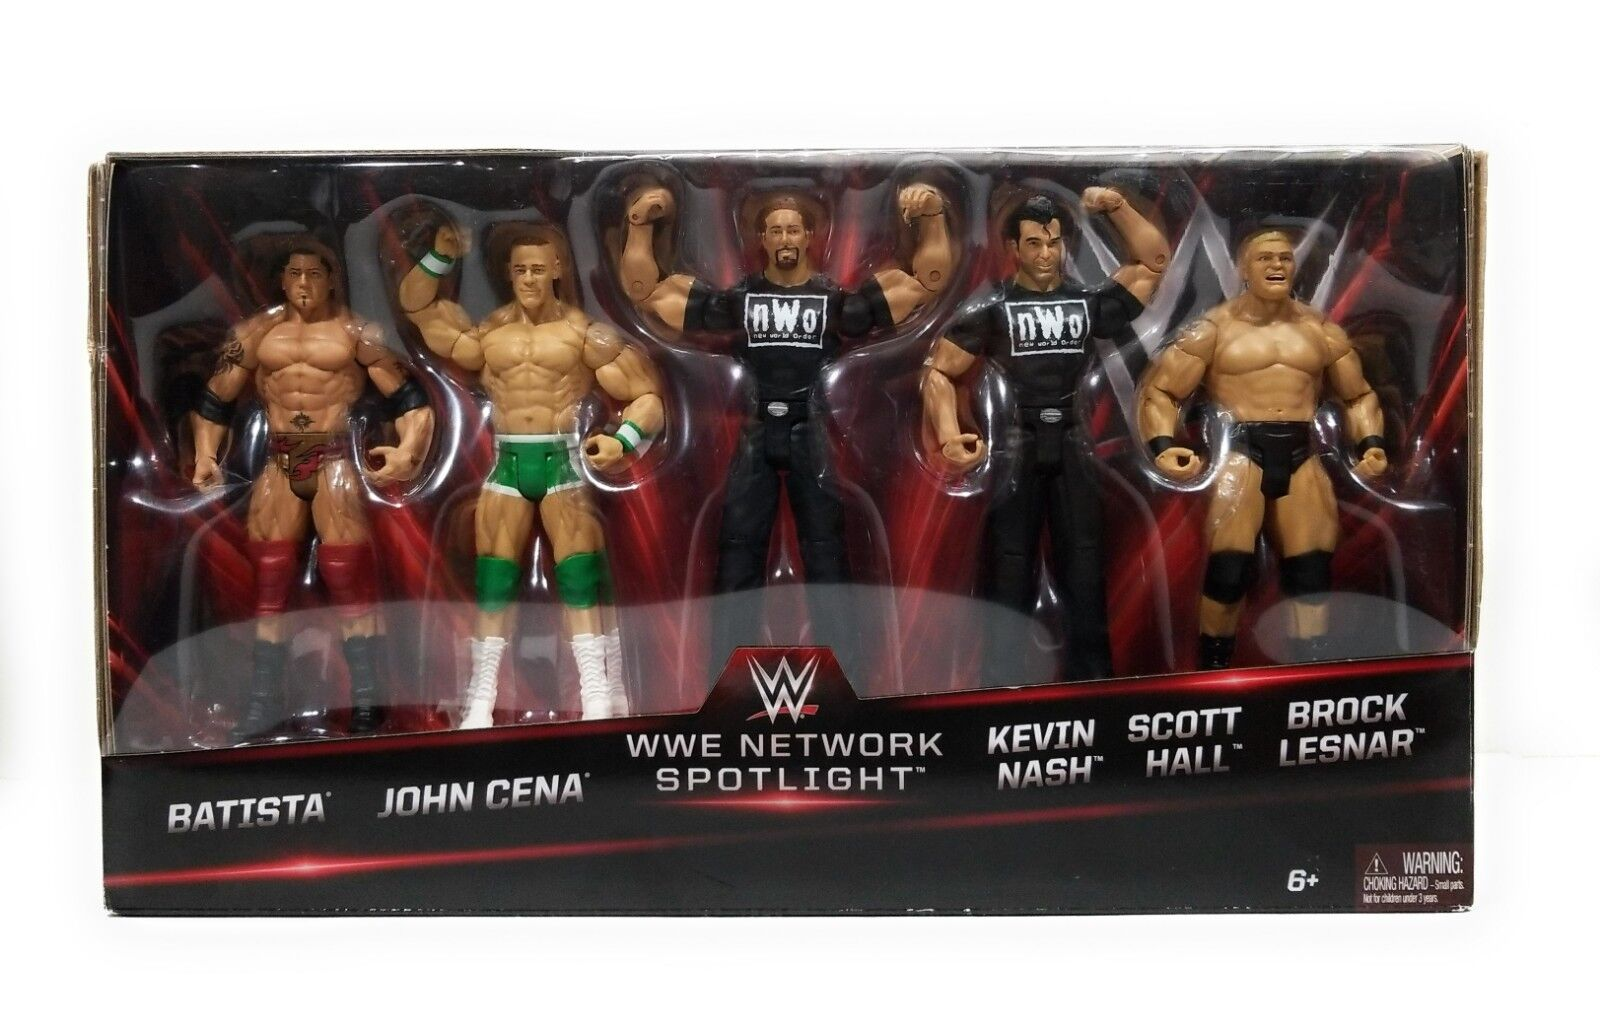 WWE Network Network Network Spotlight Collection Batista Cena Nash Hall Lesnar Action Figures a37